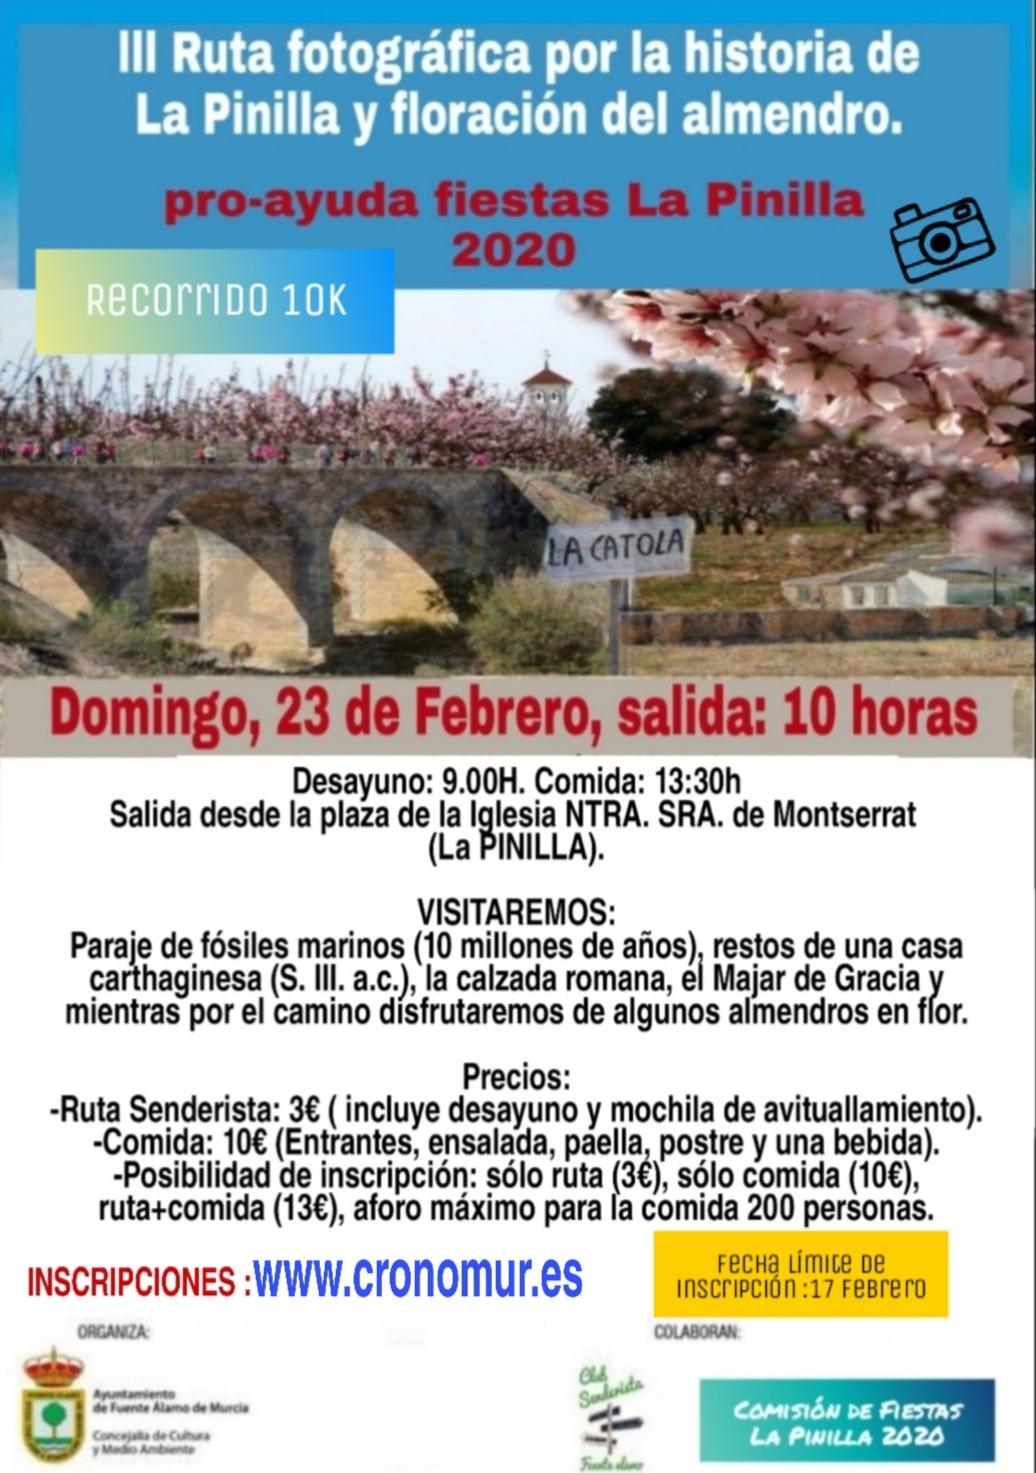 http://cronomur.es/assets/PINILLA.jpg